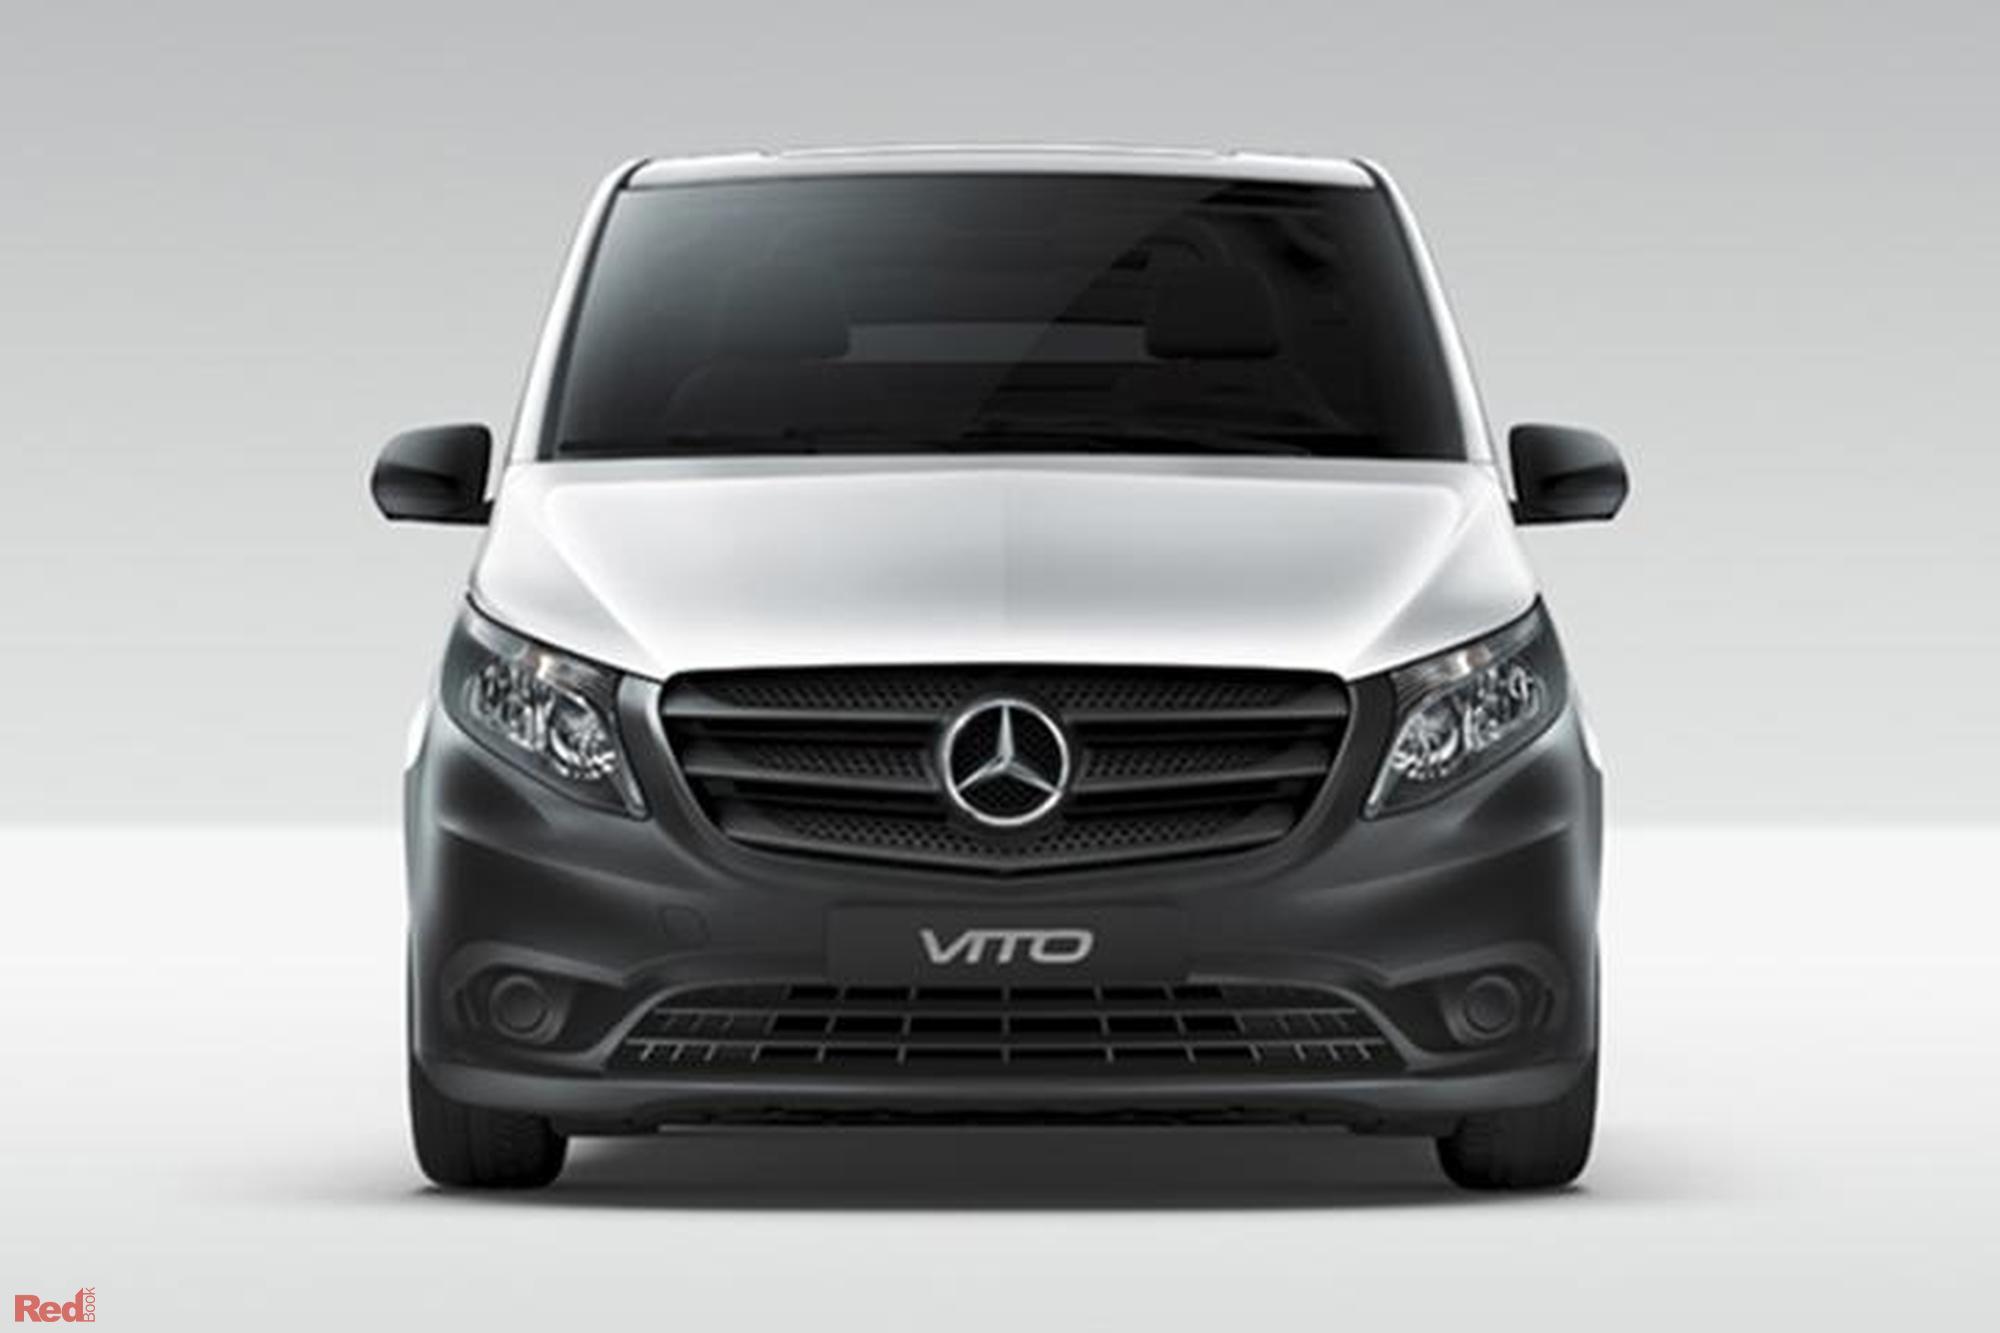 2017 Mercedes Benz Vito 111cdi